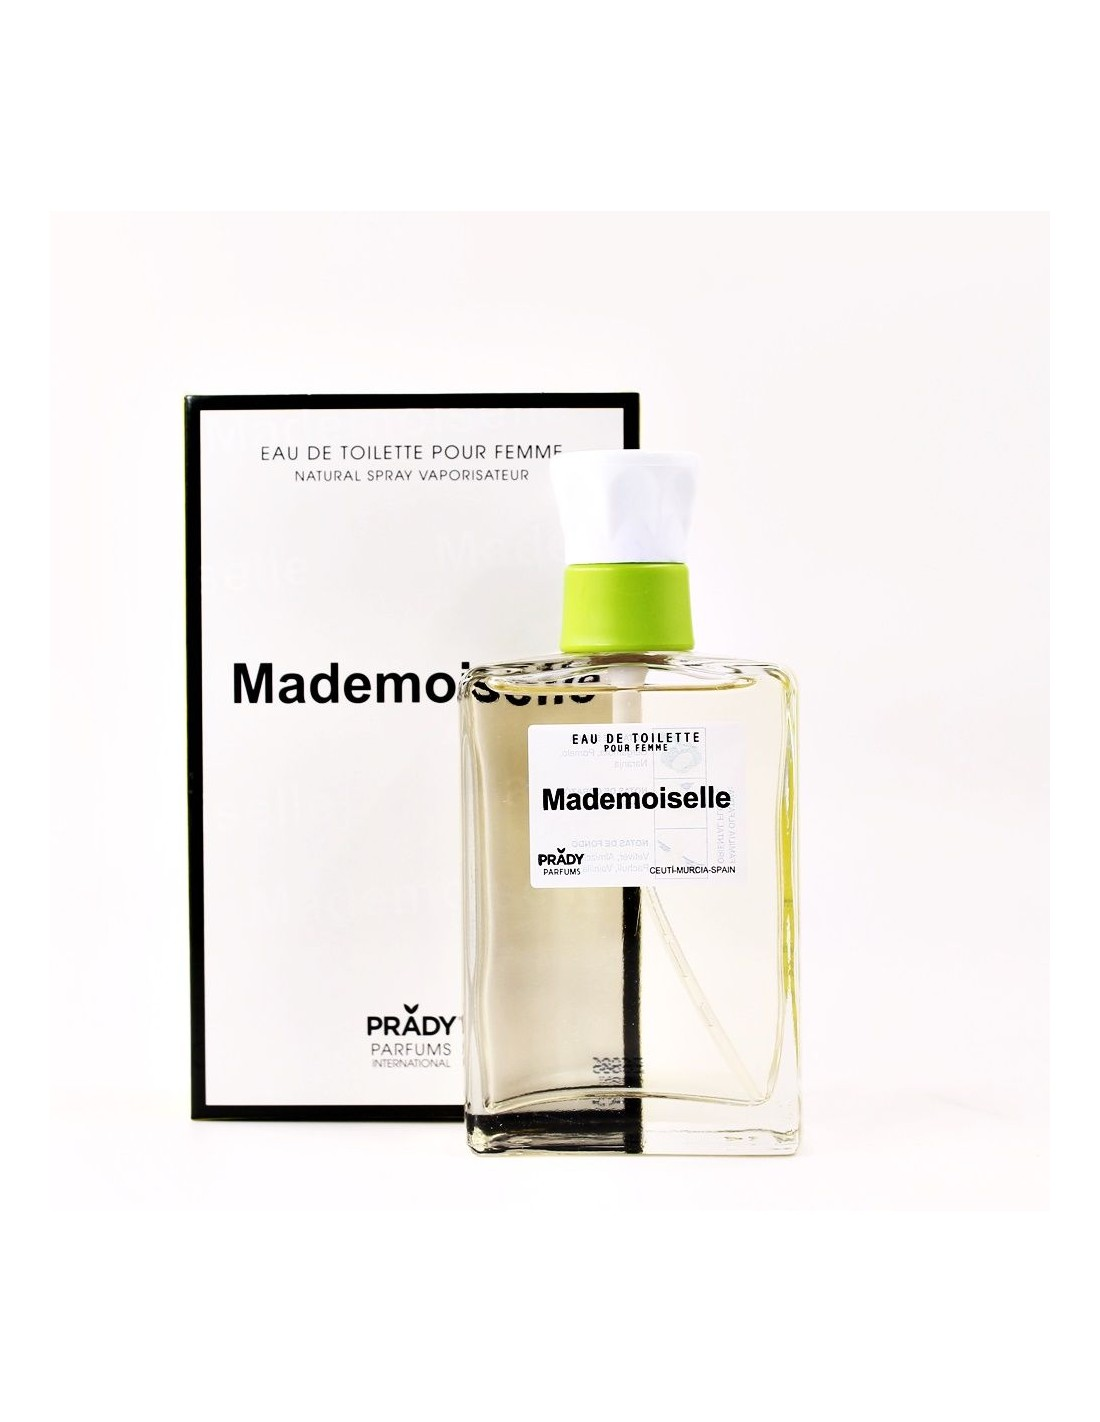 parfum generique femme parfum prady mademoiselle